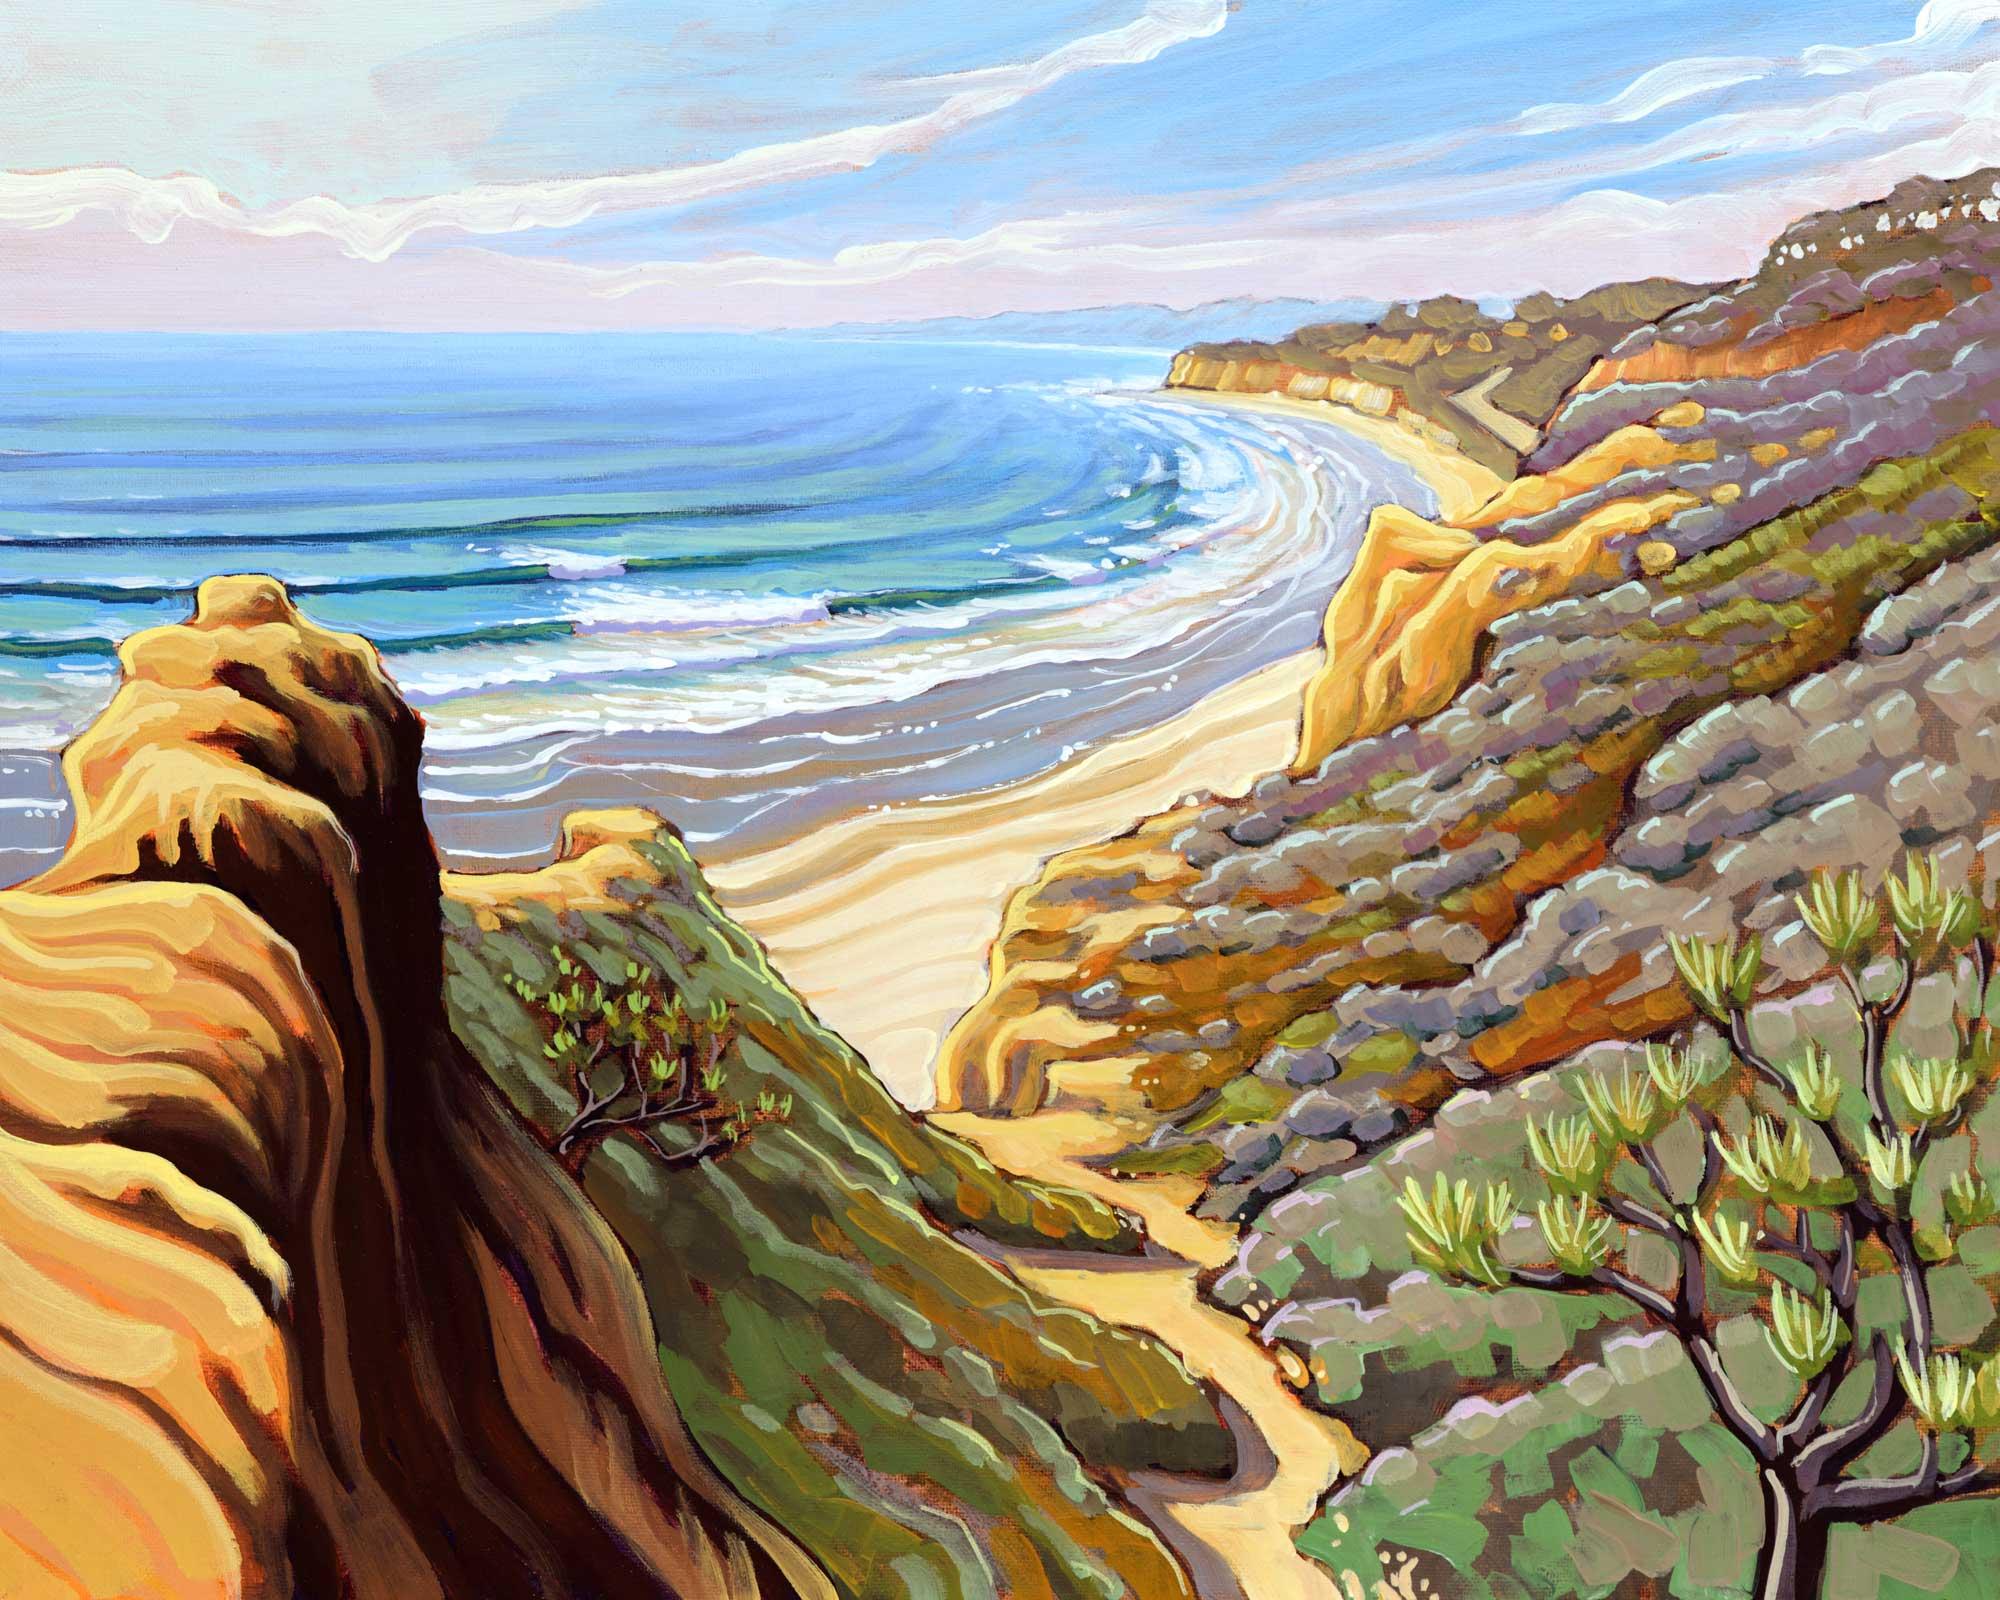 Plein air artwork form Torrey Pines State Park at Razor point on the San Diego coast of southern california